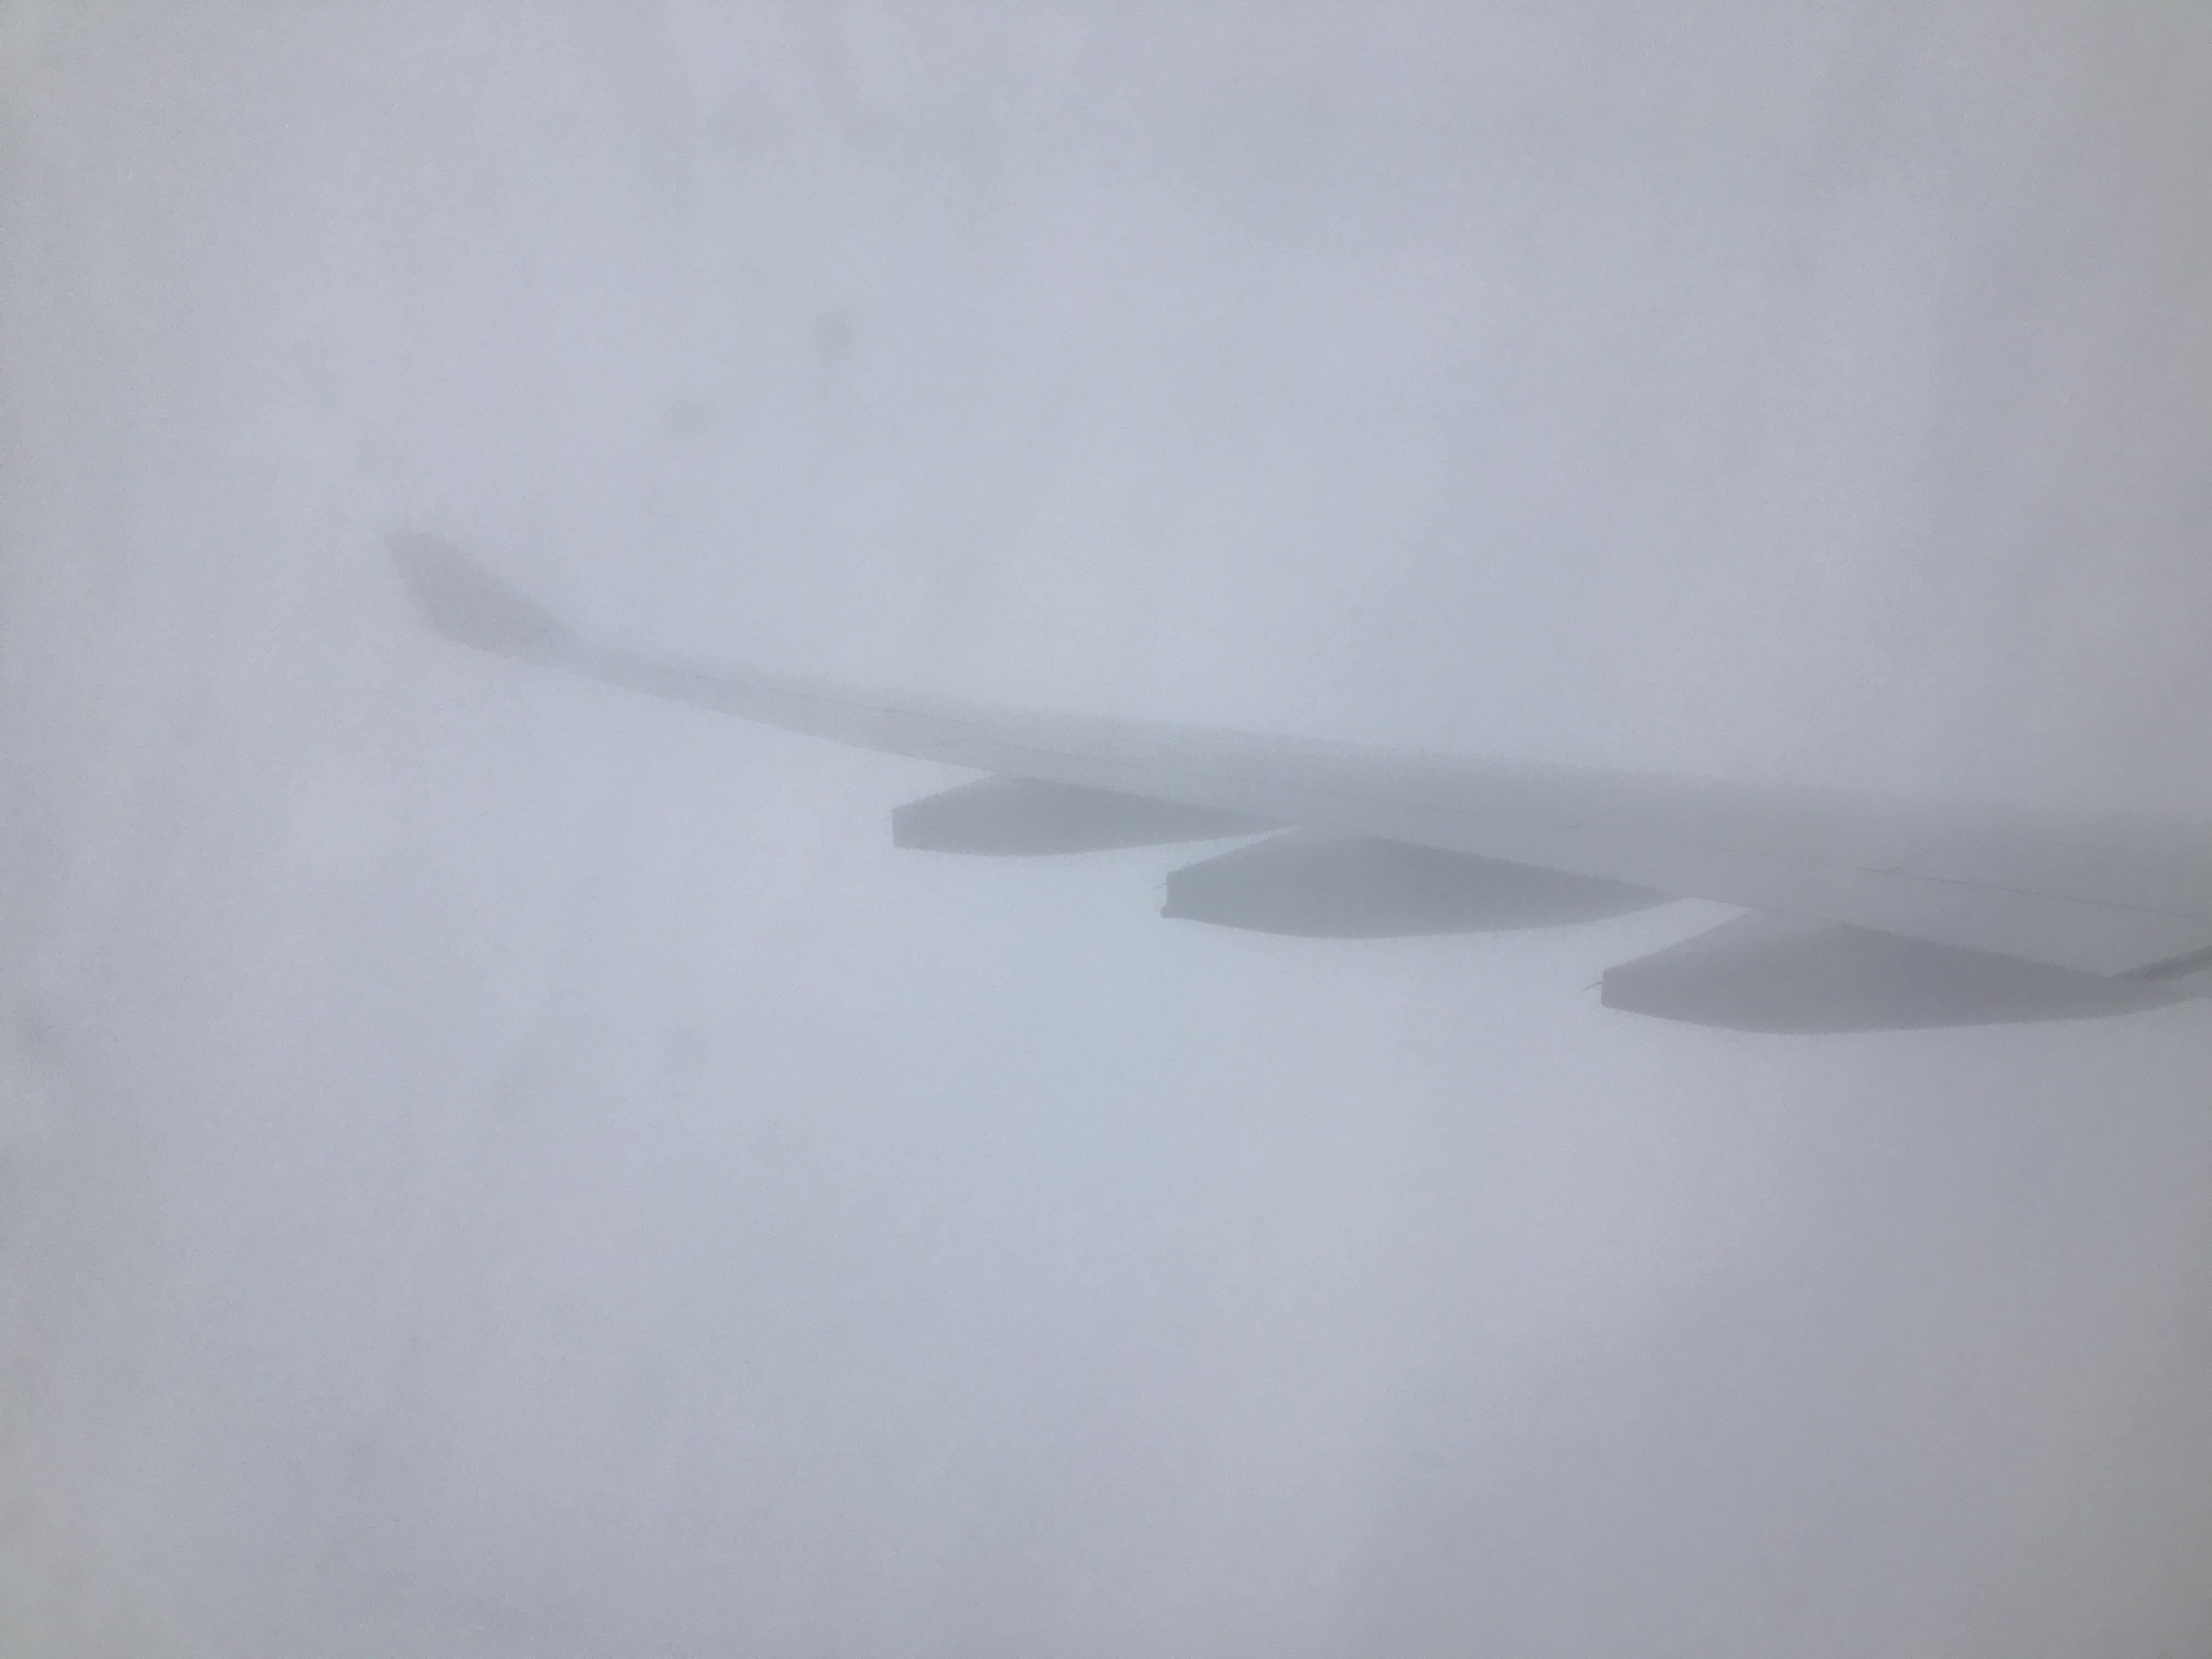 aborted landing